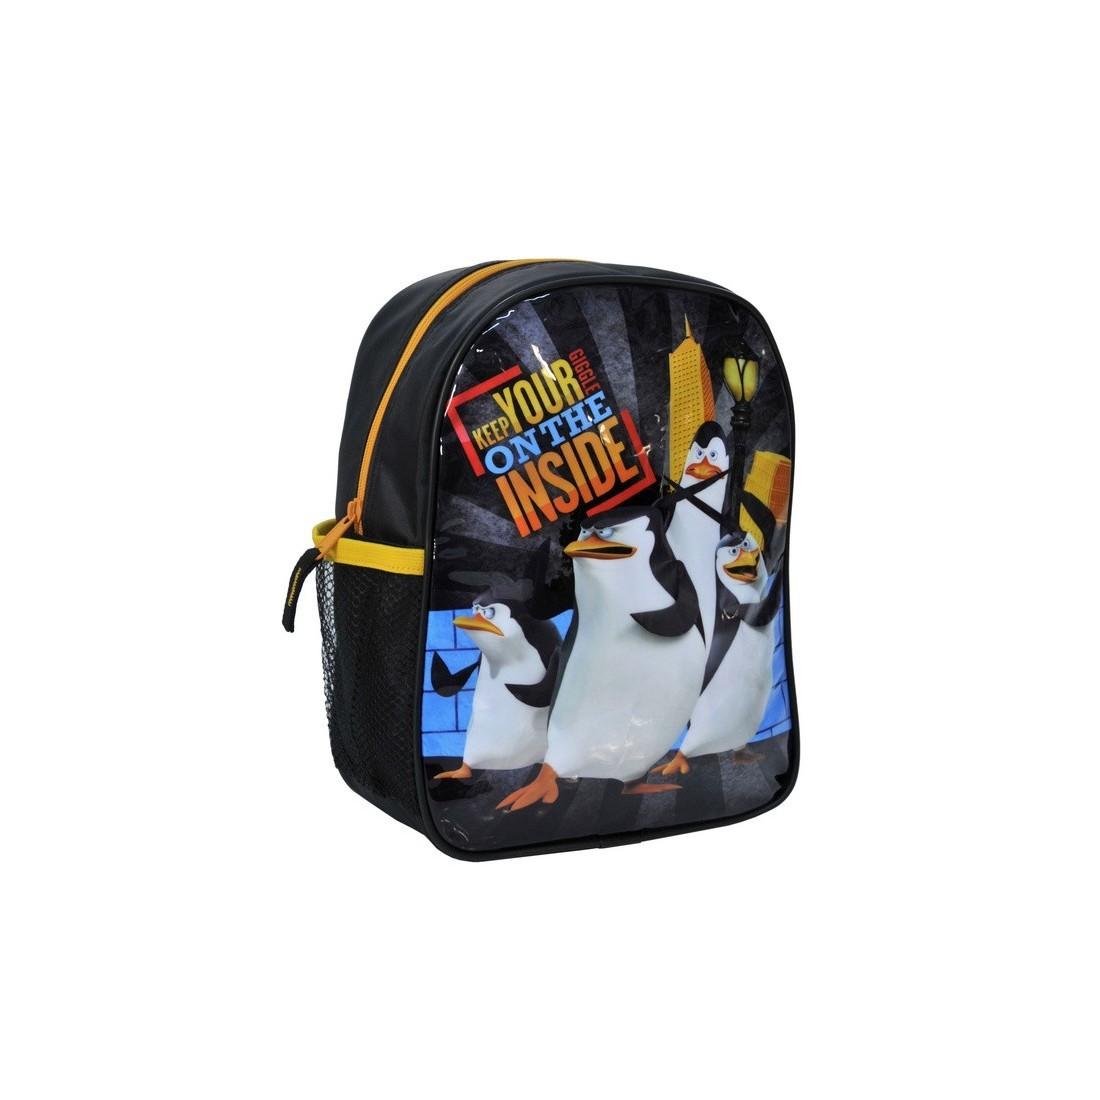 Plecaczek Pingwiny z Madagaskaru czarny - plecak-tornister.pl